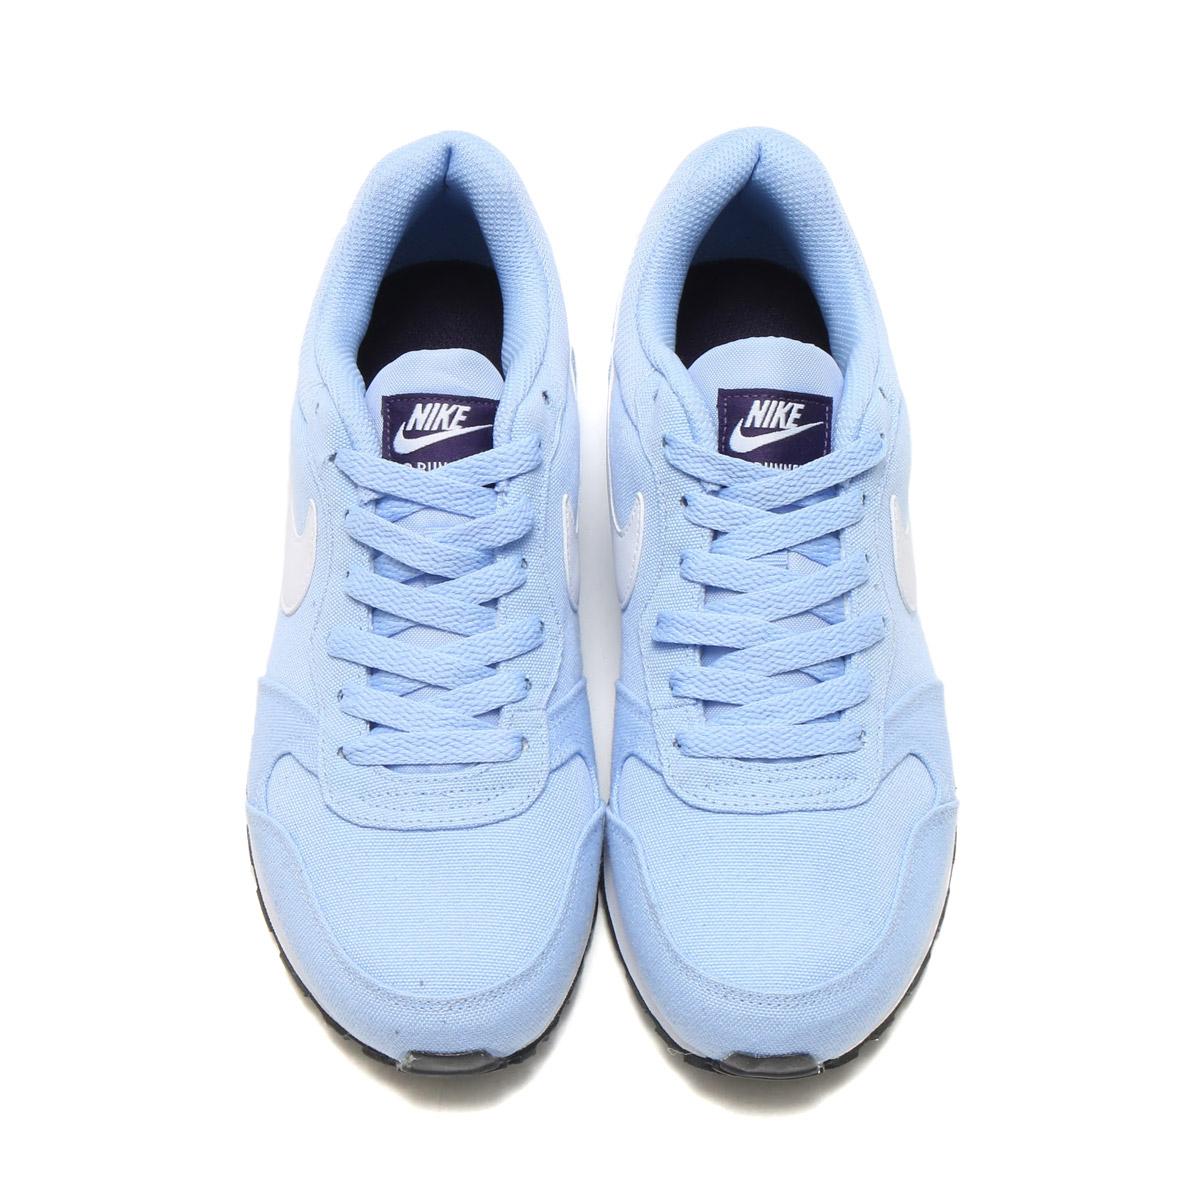 NIKE WMNS MD RUNNER 2 (Nike women MD runner 2) ALUMINUM/WHITE-PURPLE DYNASTY 17SU-I